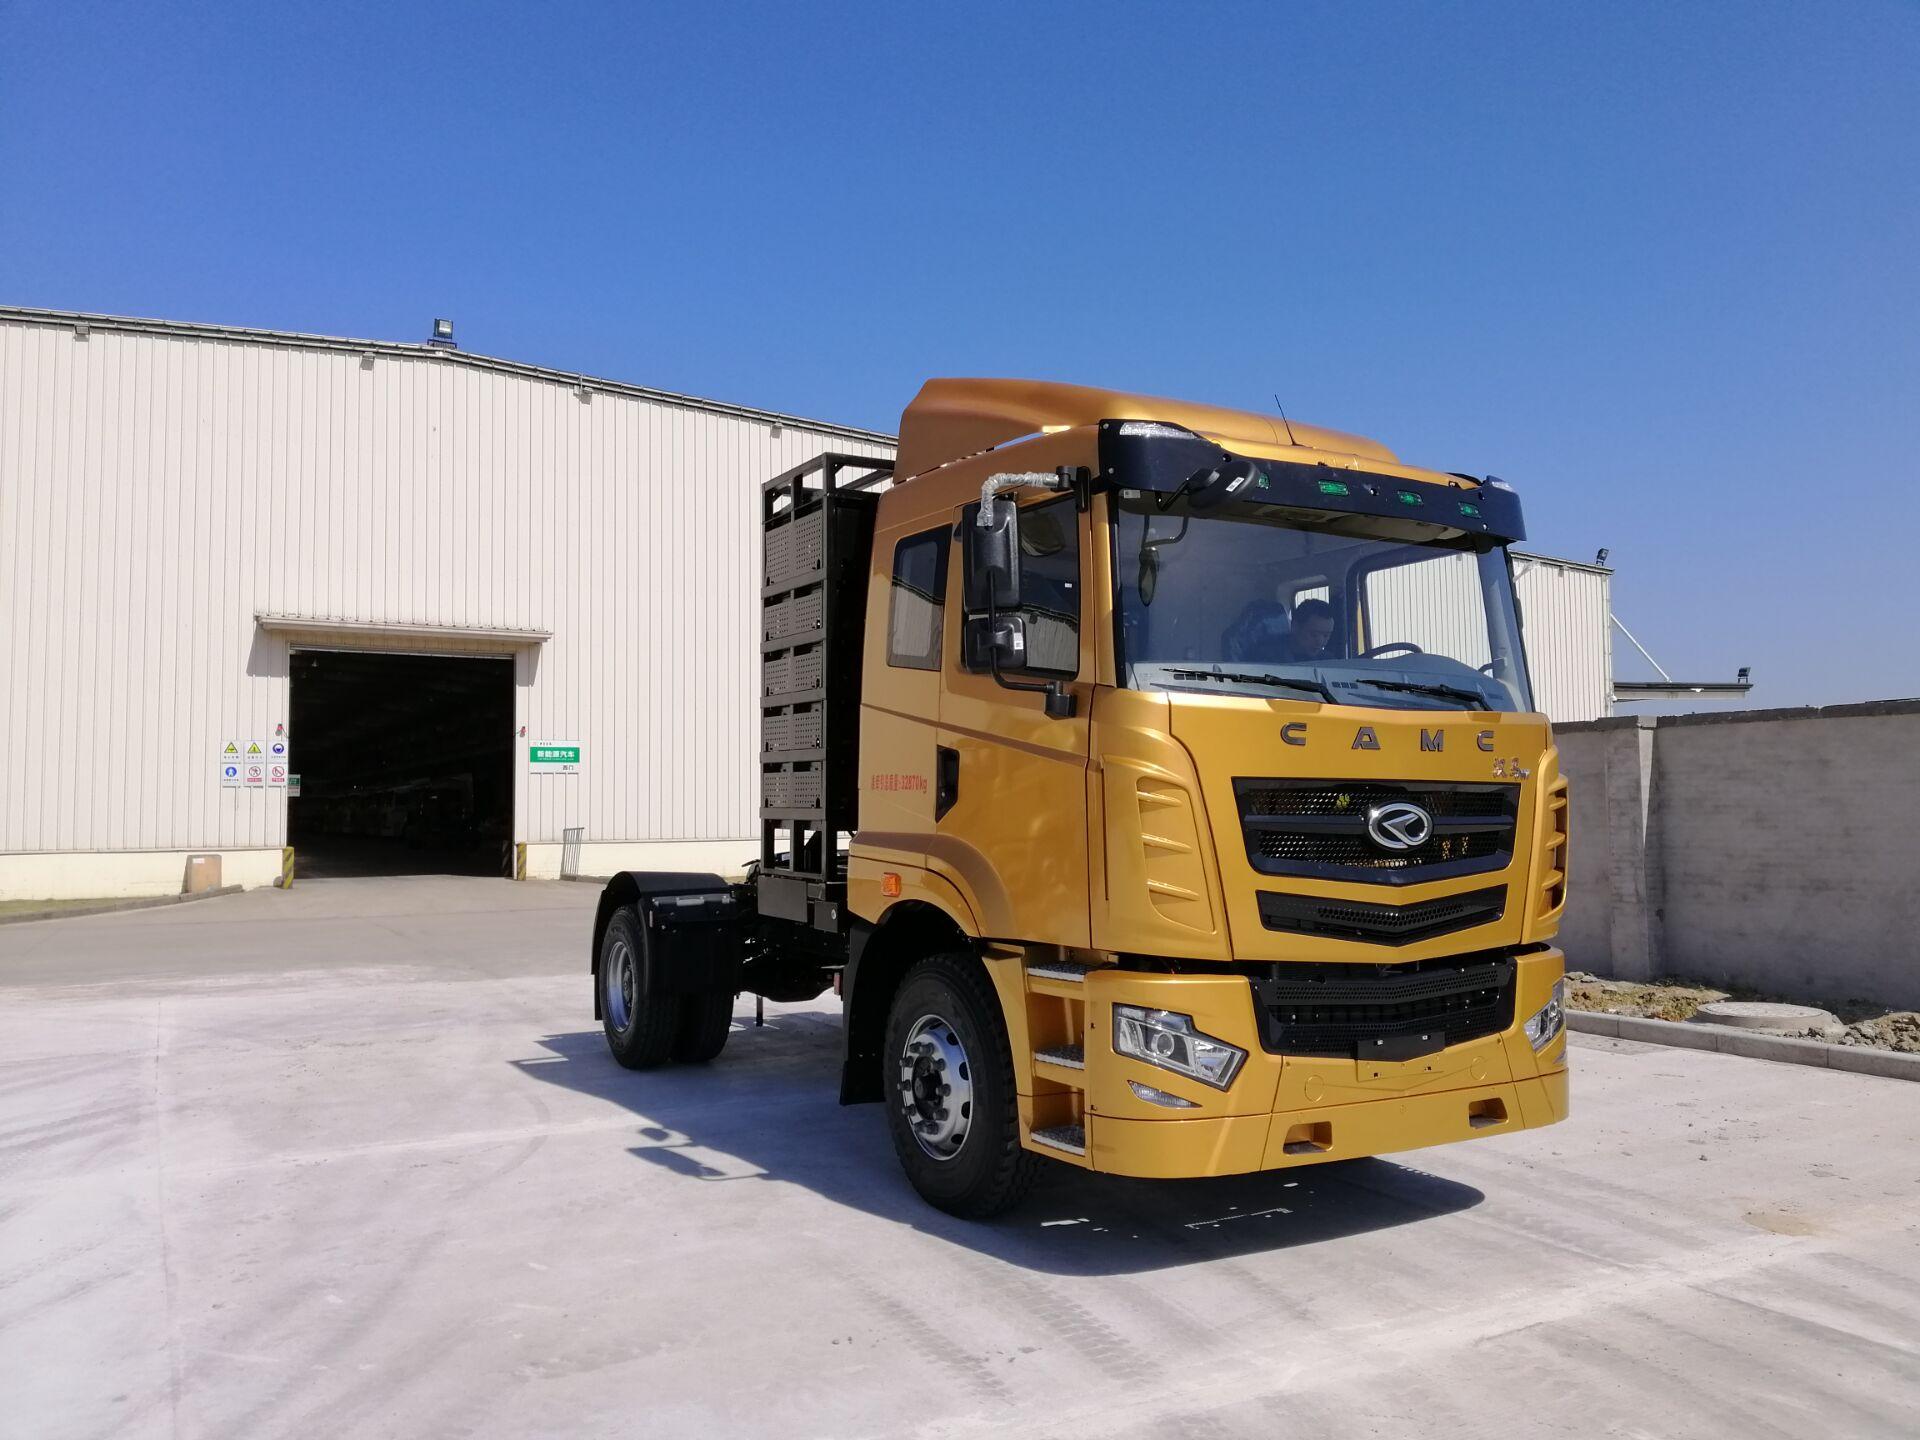 CAMC new energy heavy truck series